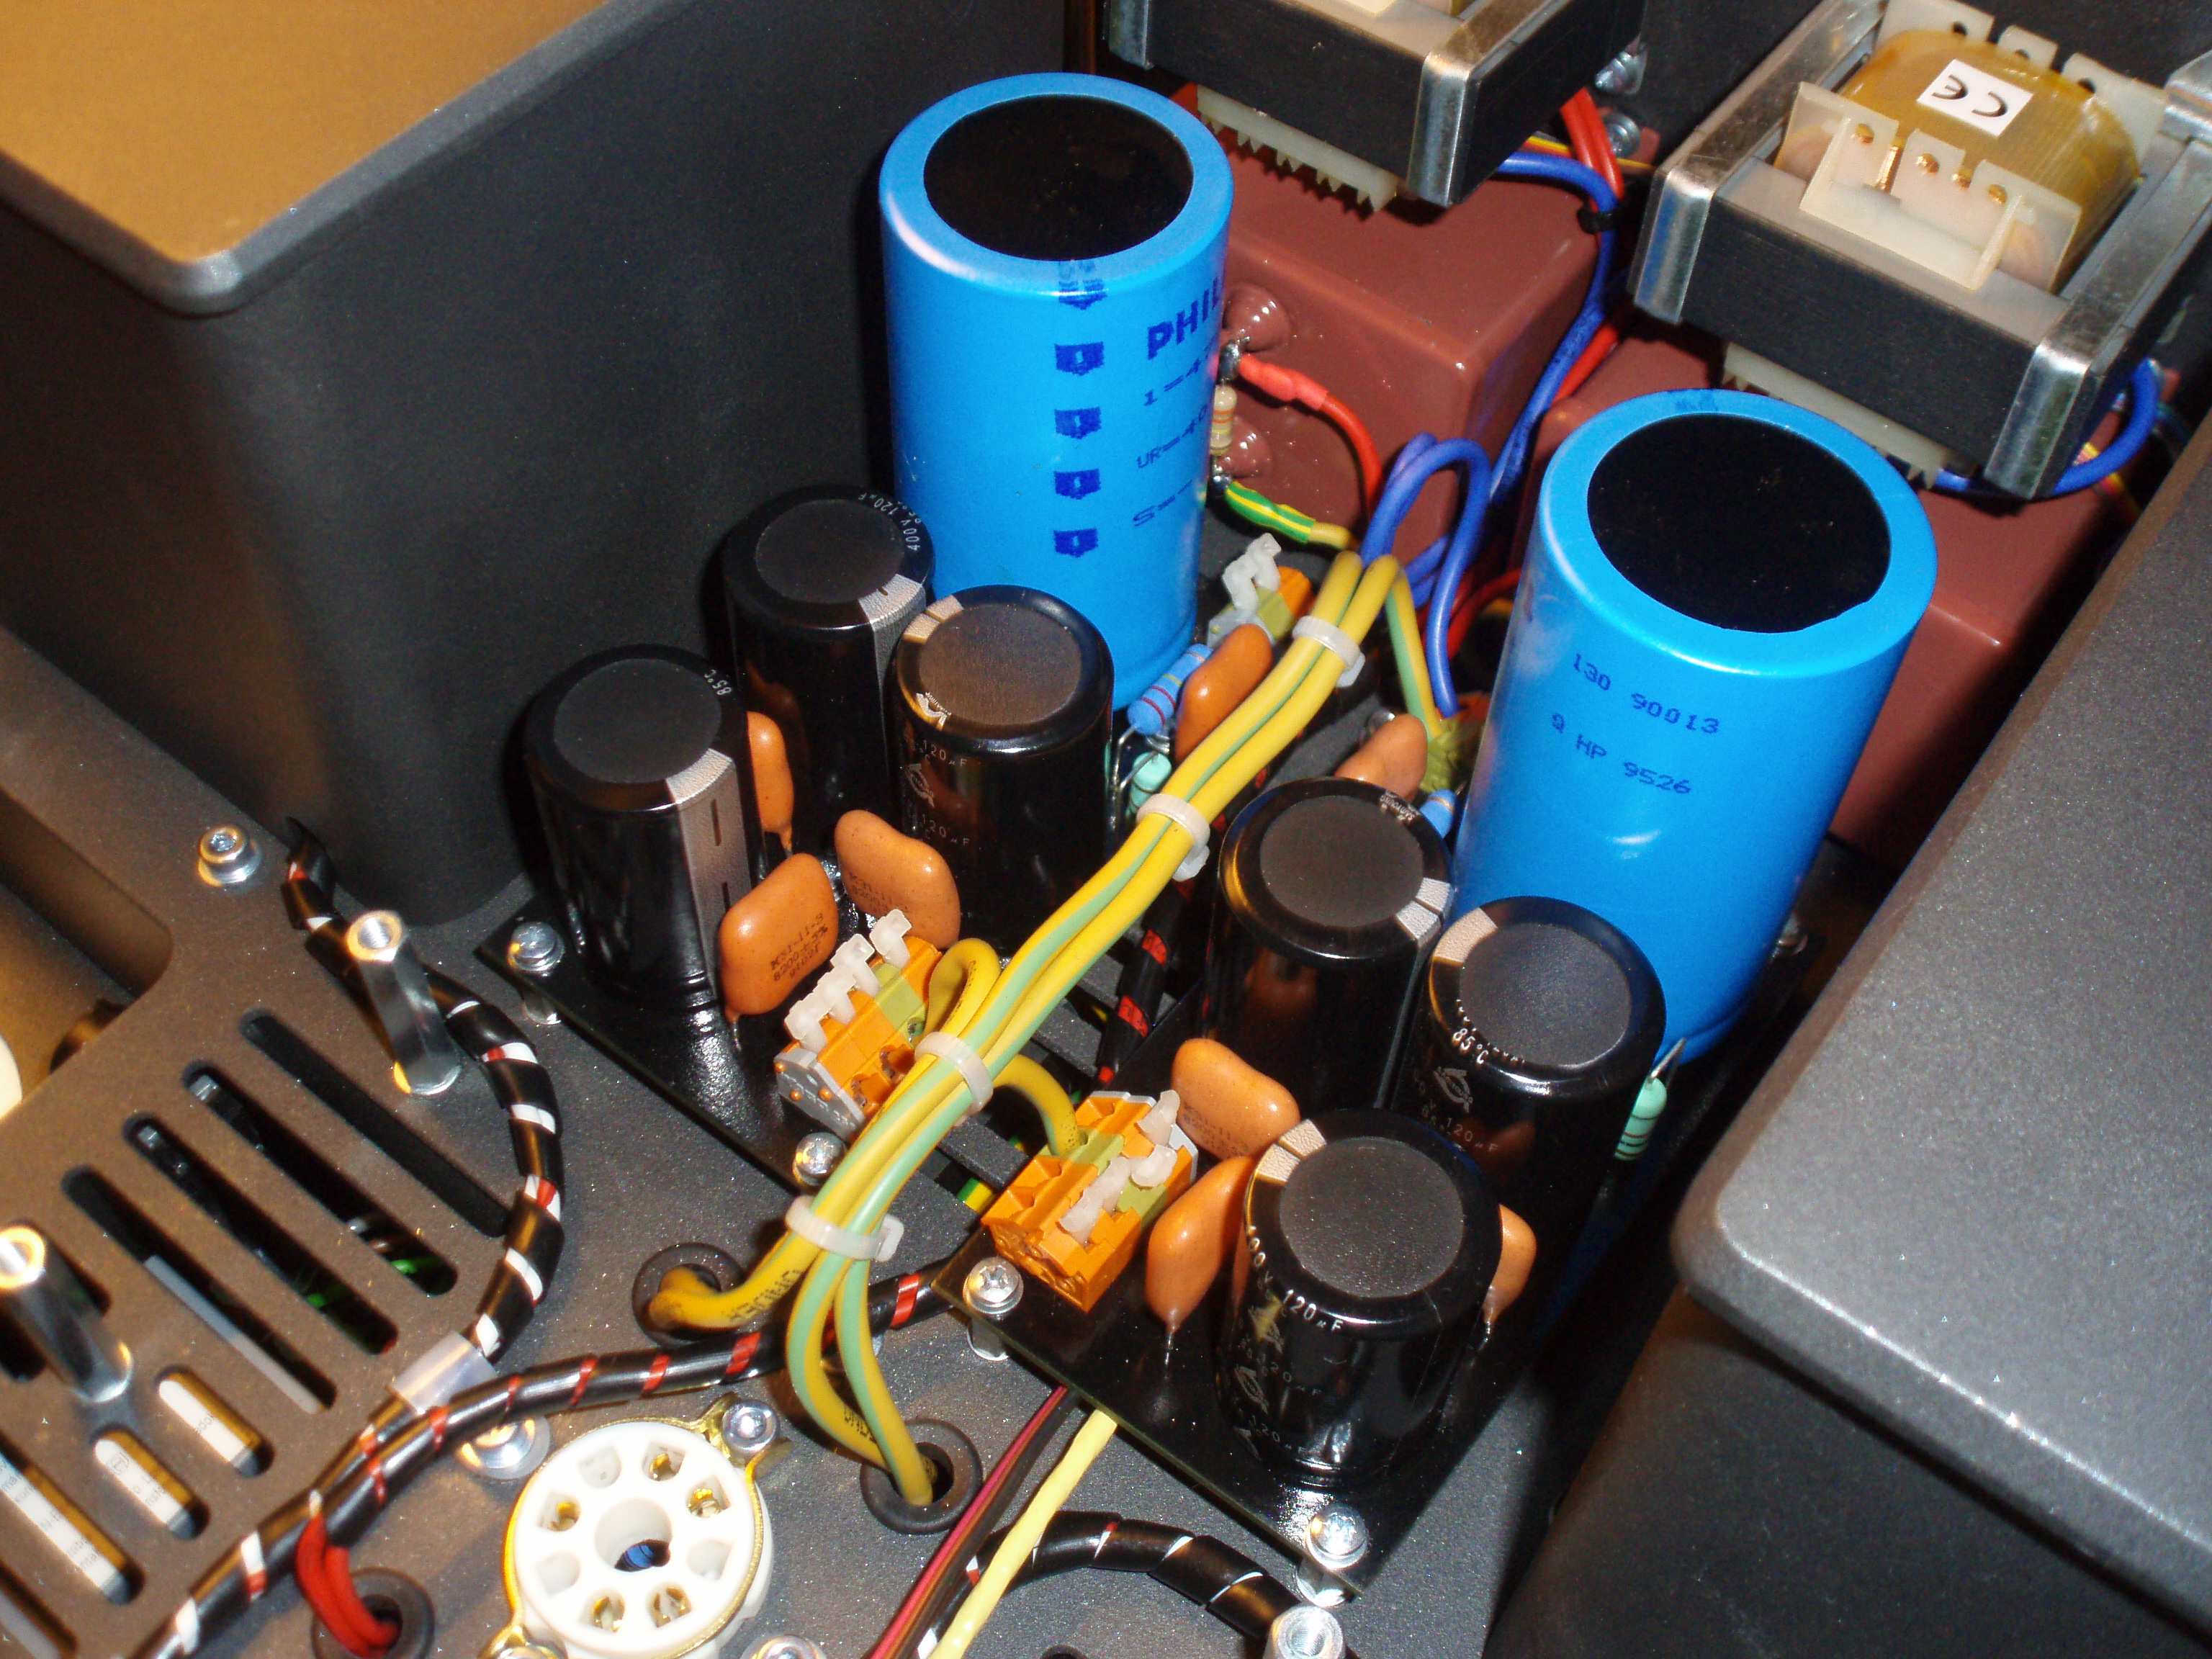 gm70 tube amplifier veridian utopia